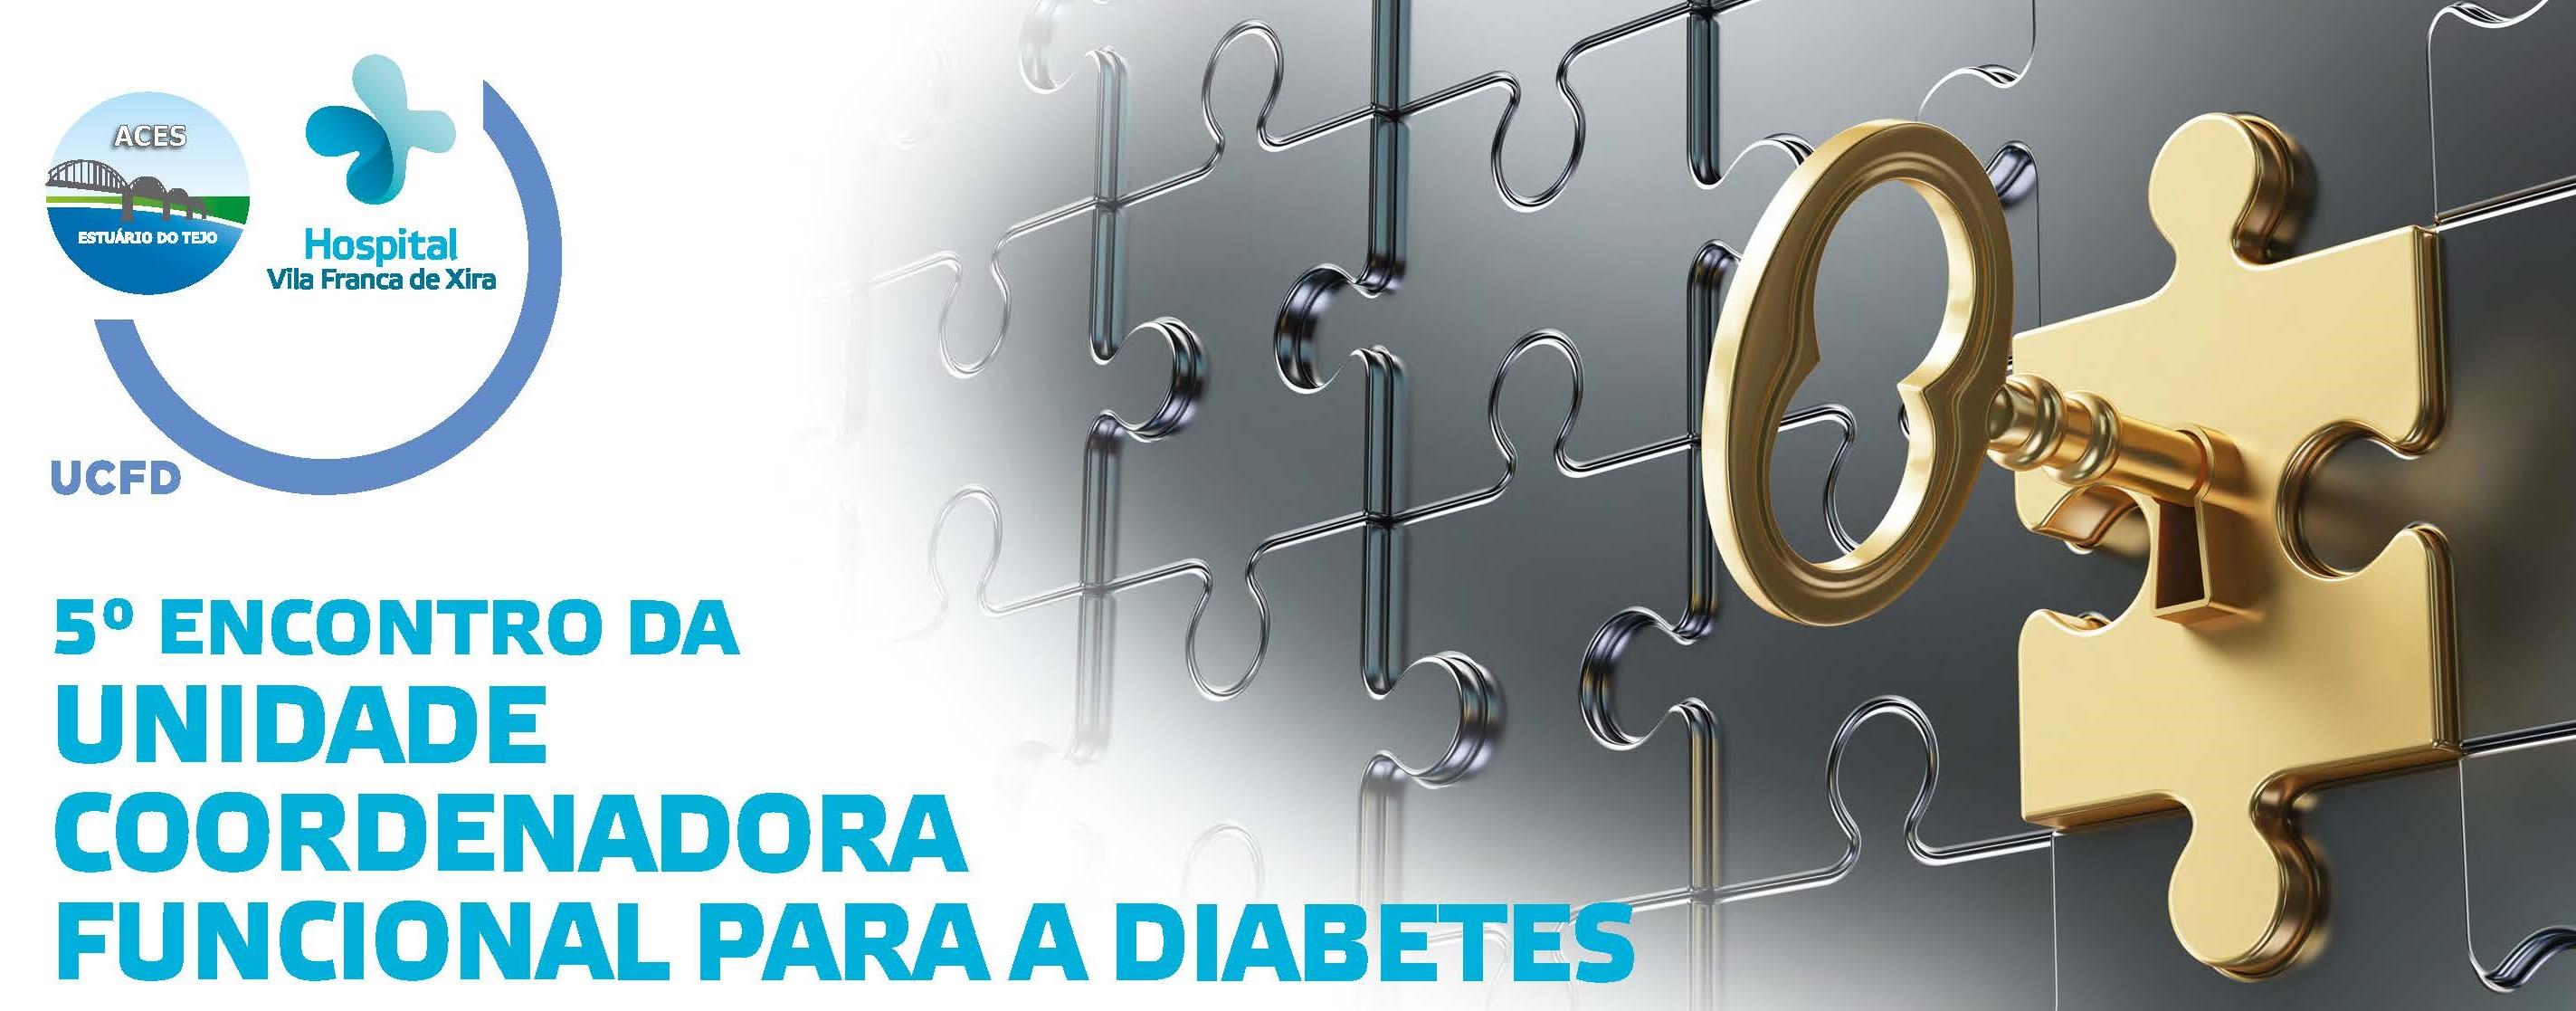 hospital-de-vila-franca-de-xira-5º Encontro Unidade Coordenadora Funcional da Diabetes